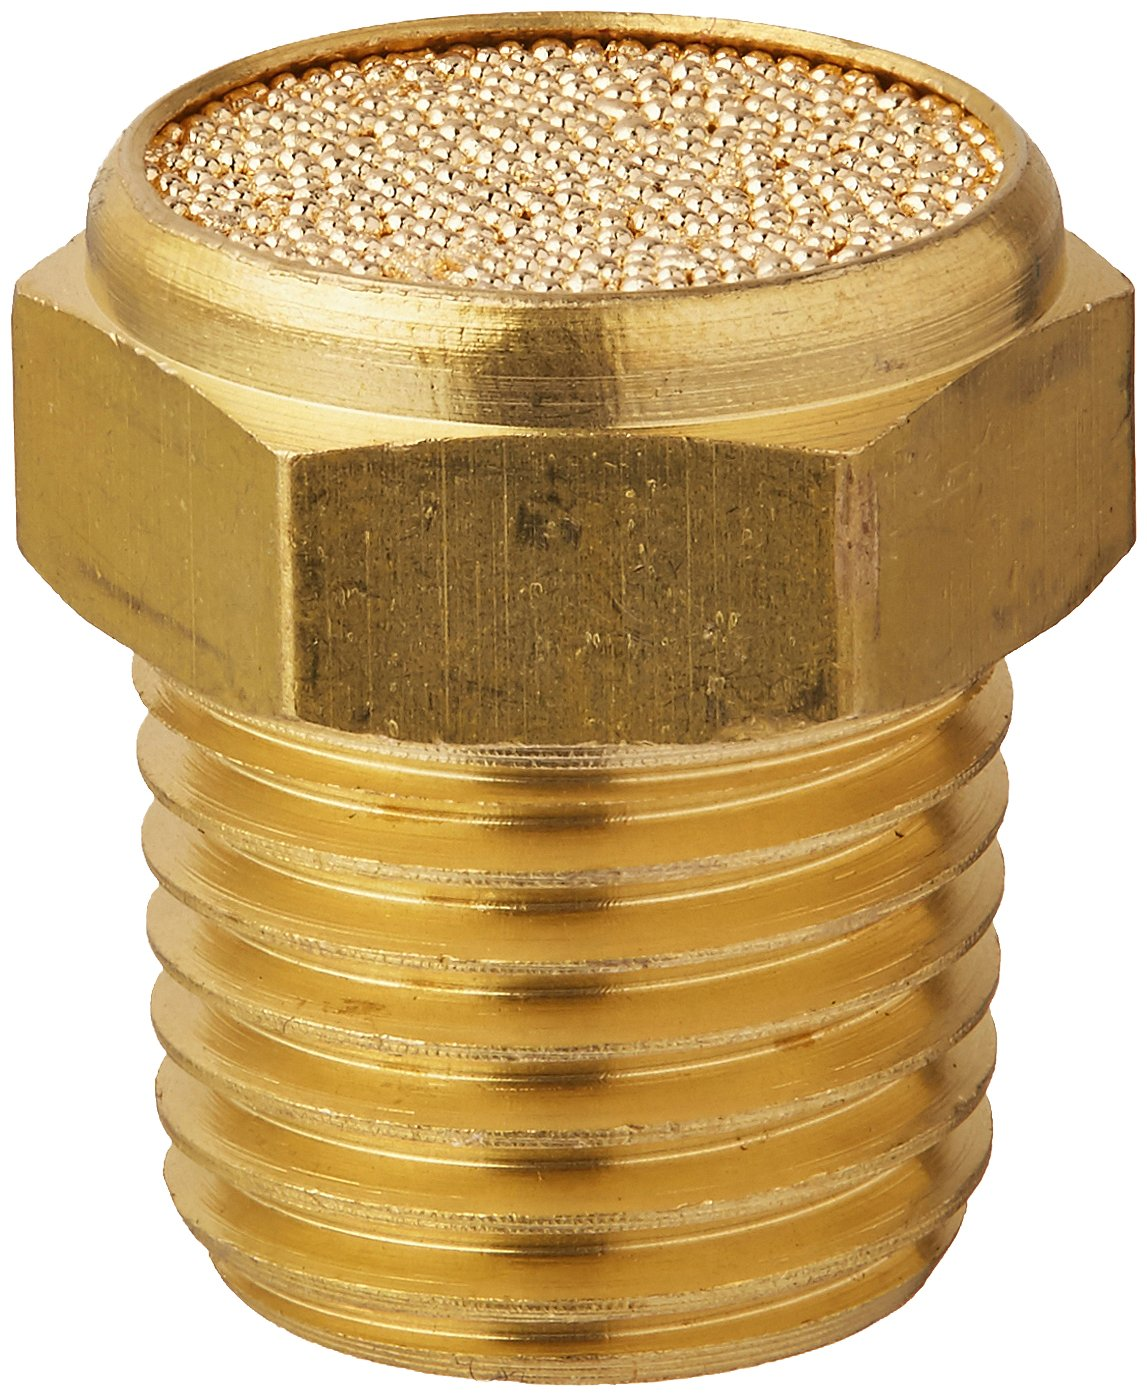 Manufacturer direct delivery MettleAir BBV-N02 Flat Pneumatic Bronze Muffler Sintered Filter 40% OFF Cheap Sale